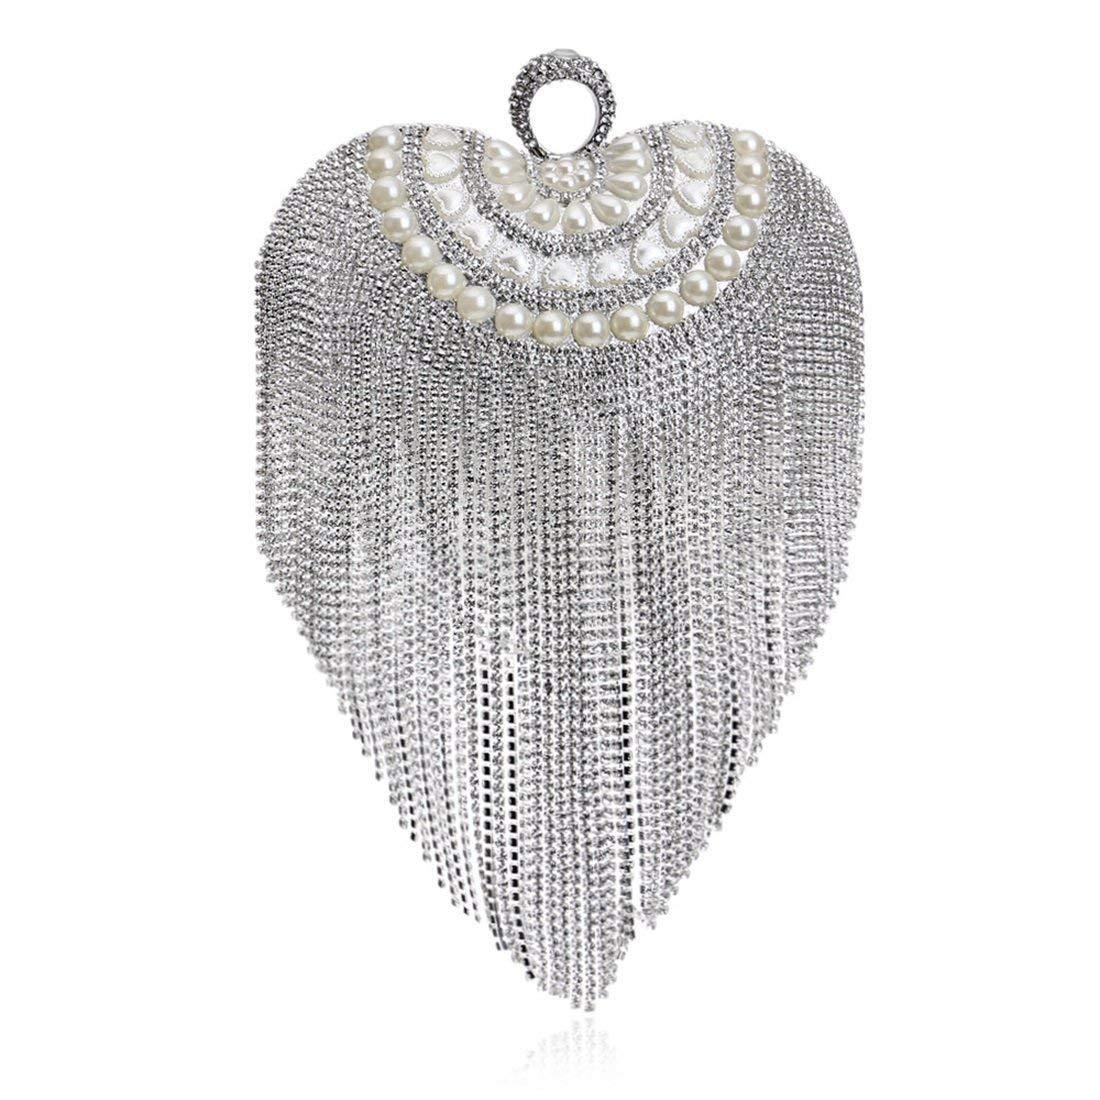 Fly mini heart-shaped tassel evening bag luxury luxury bride lady dress clutch evening bag (Color : Silver)